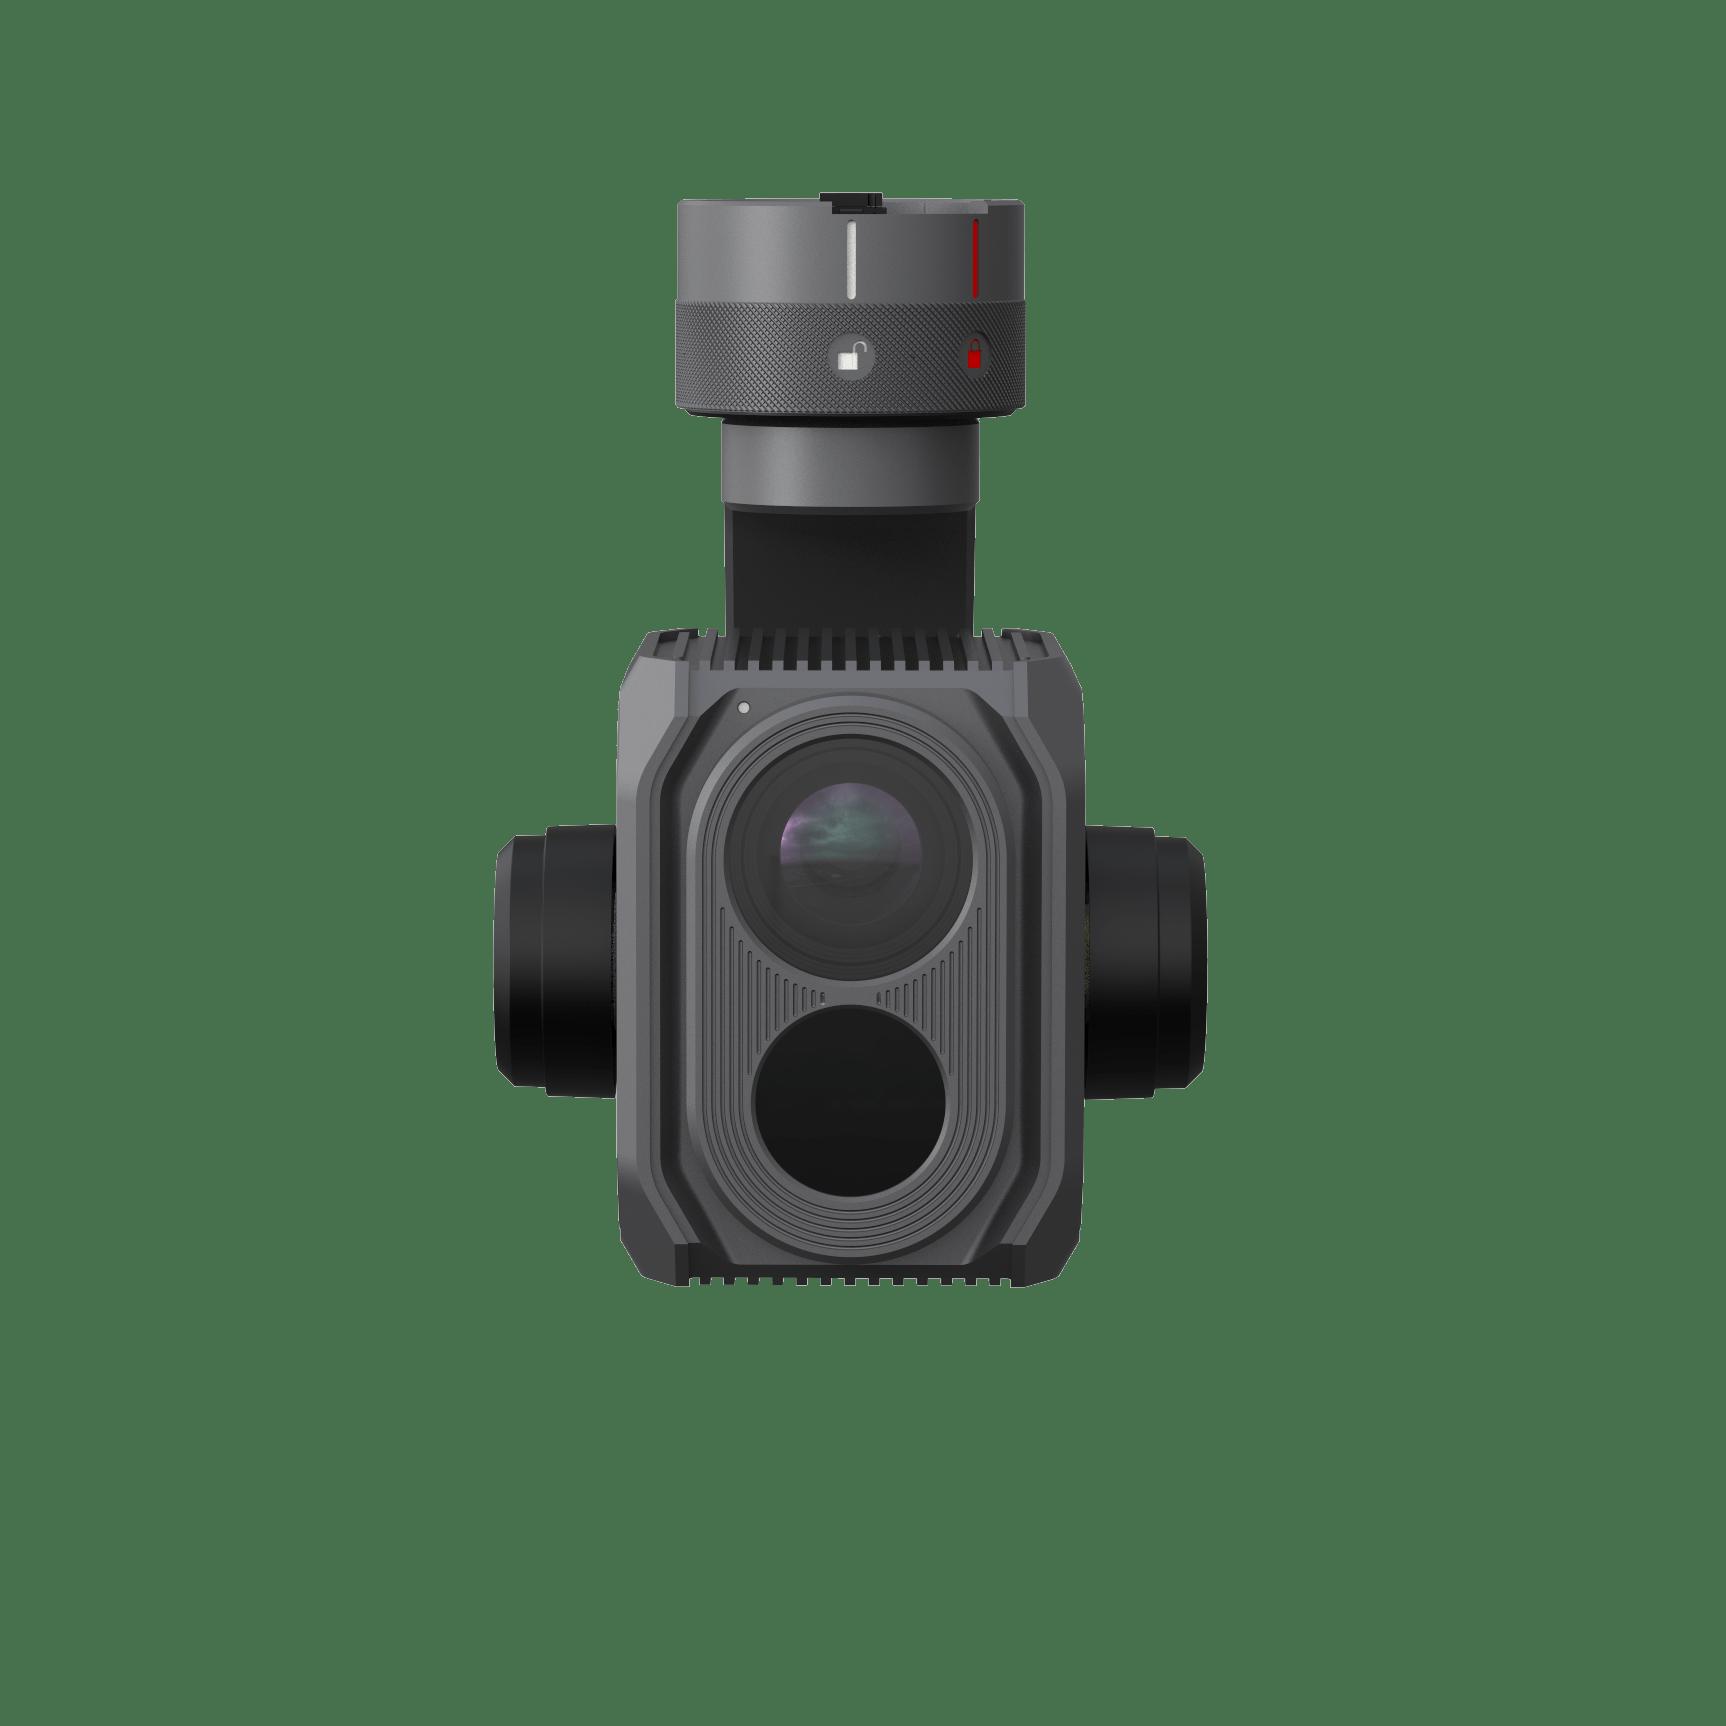 E10T Wärmebildkamera Yuneec. E10TVx Kamera 640 x 512 H520E. Wärmebildkamera H520E von Yuneec hochauflösend. 640p Wärmebildkamera Yuneec